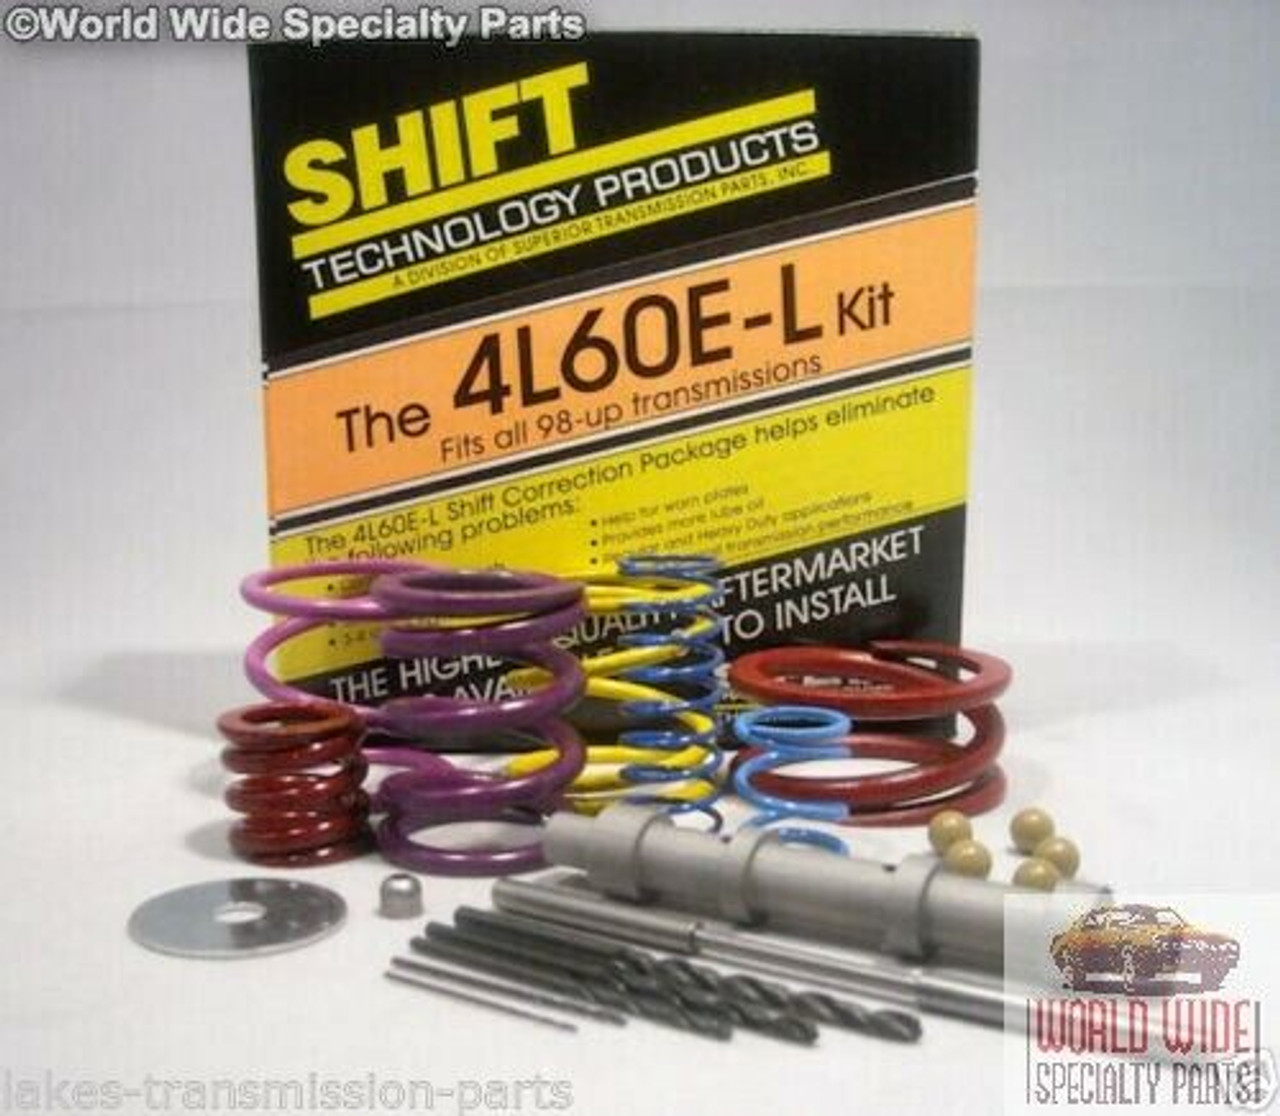 GM 4L60E Transmission Shift Correction Kit 1993-1997 with Superior Updates